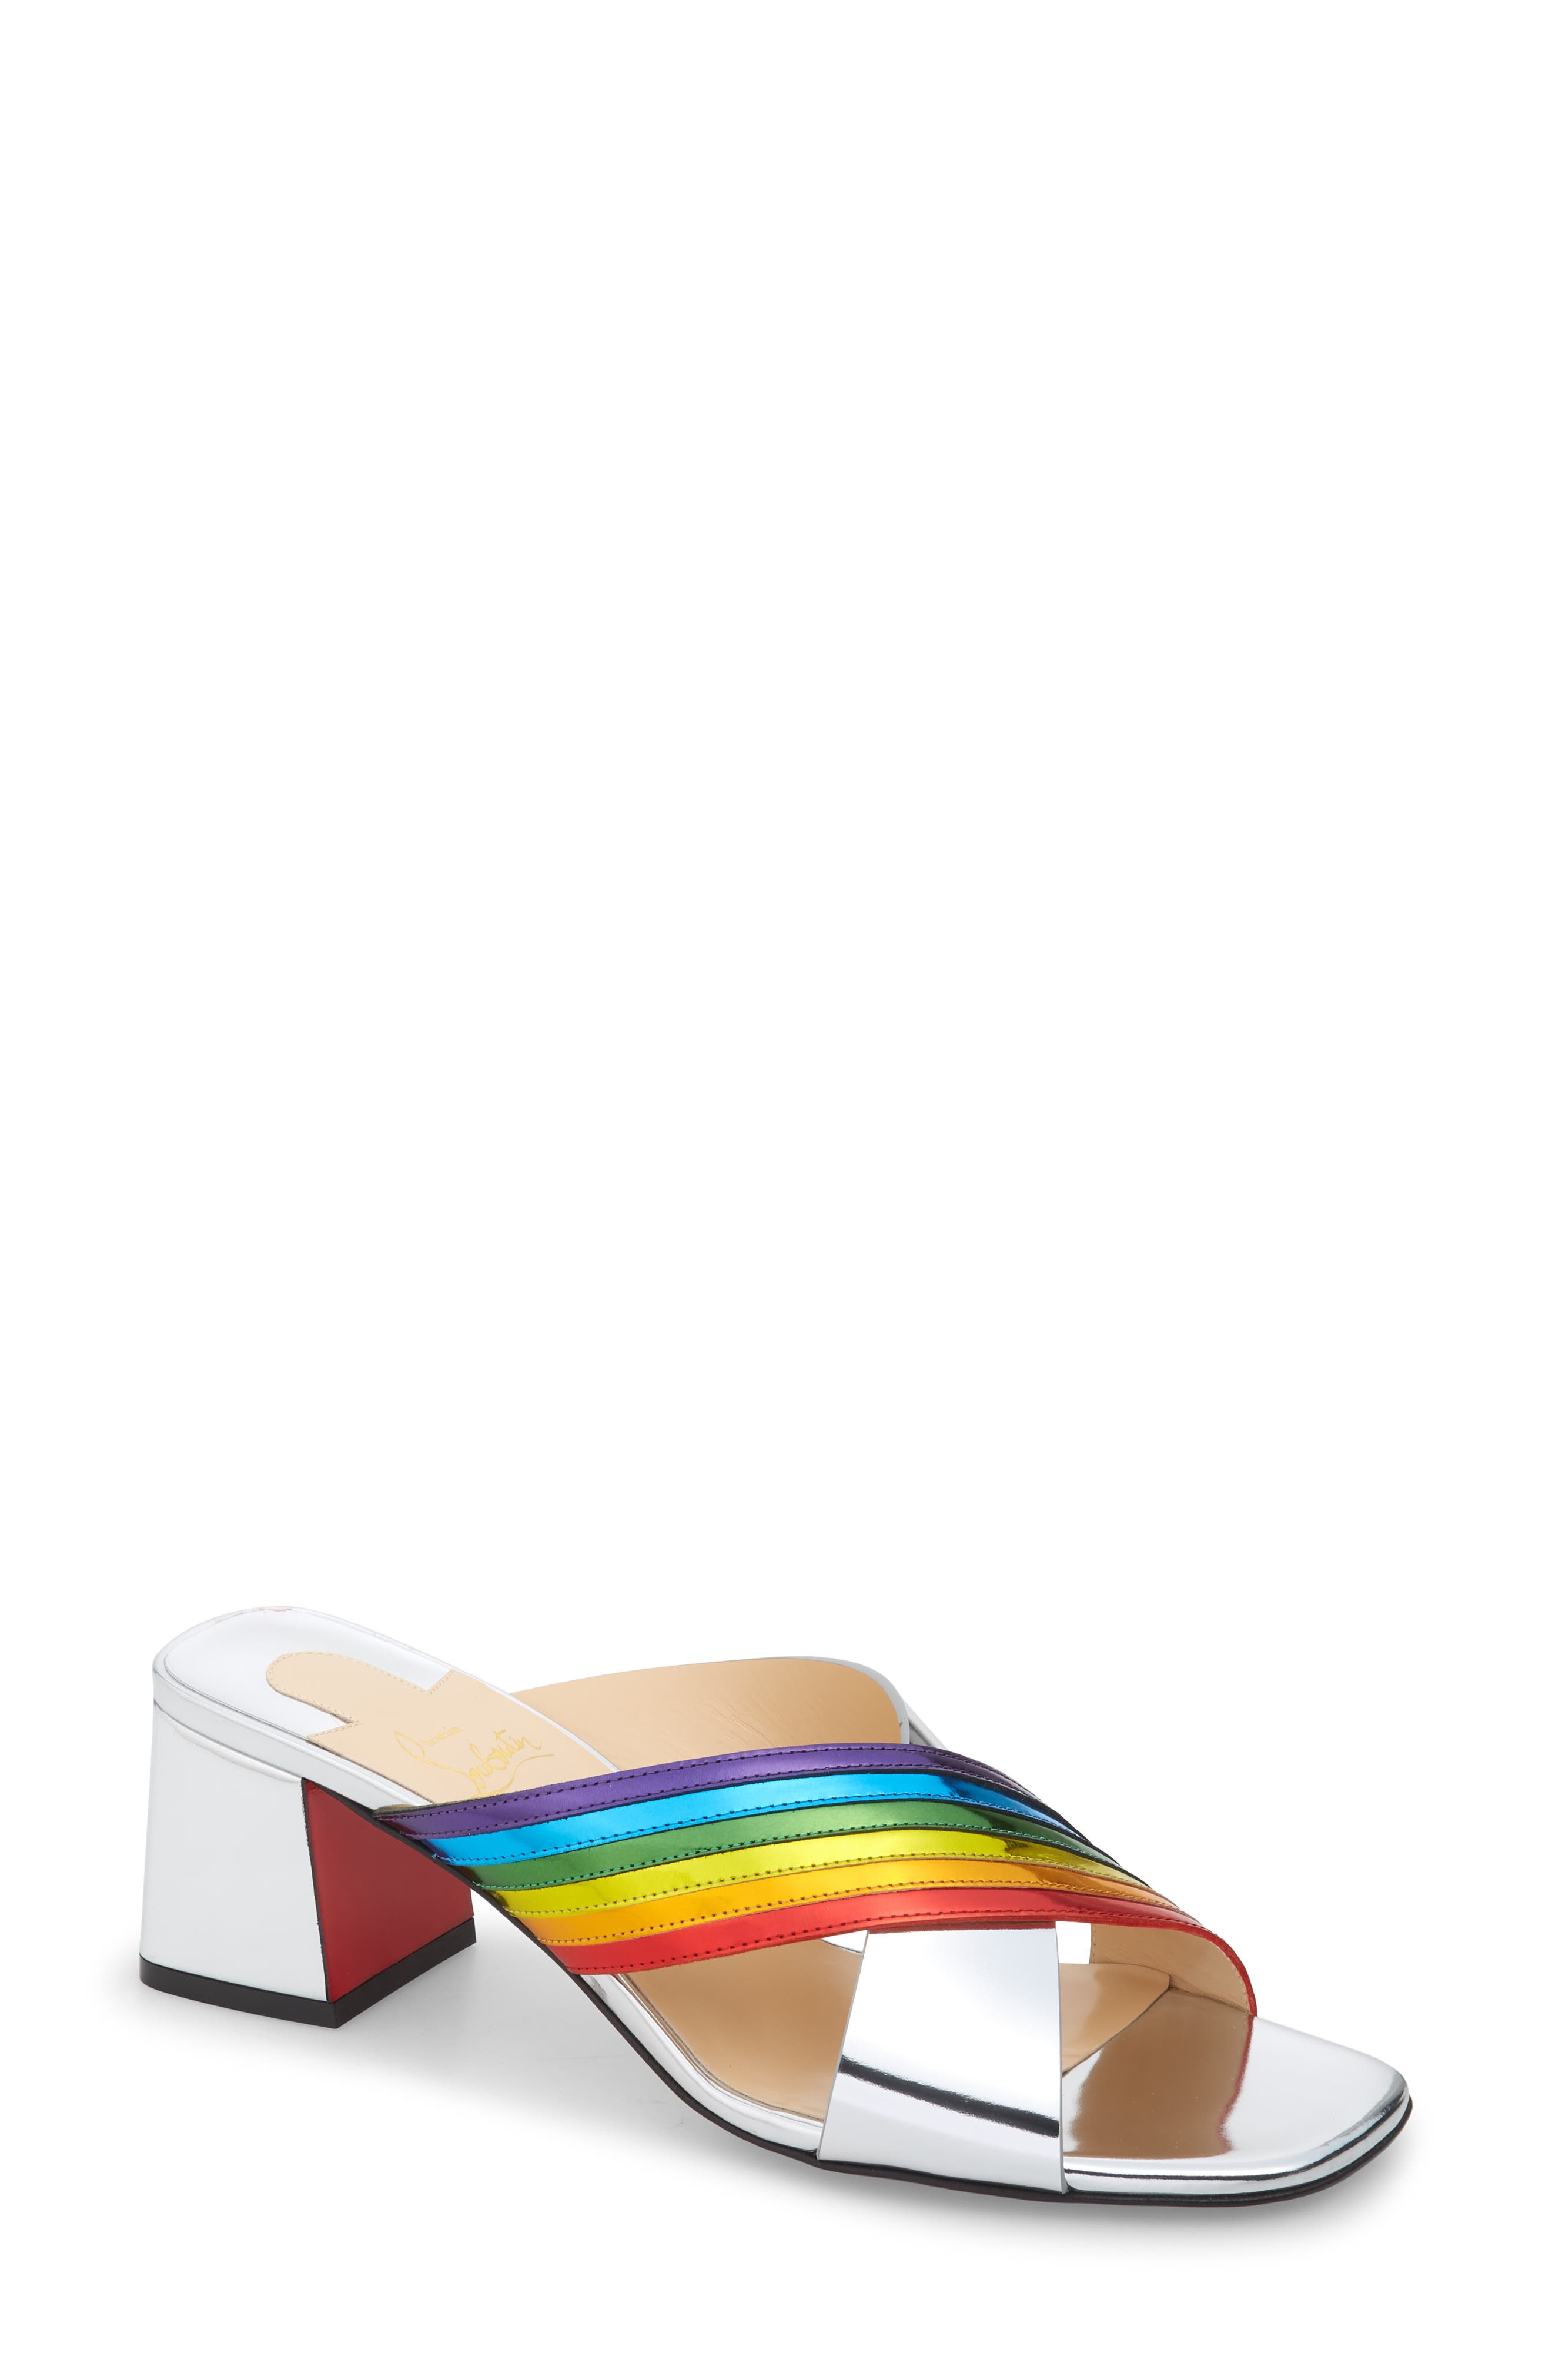 Christian Louboutin Arkenmule Rainbow